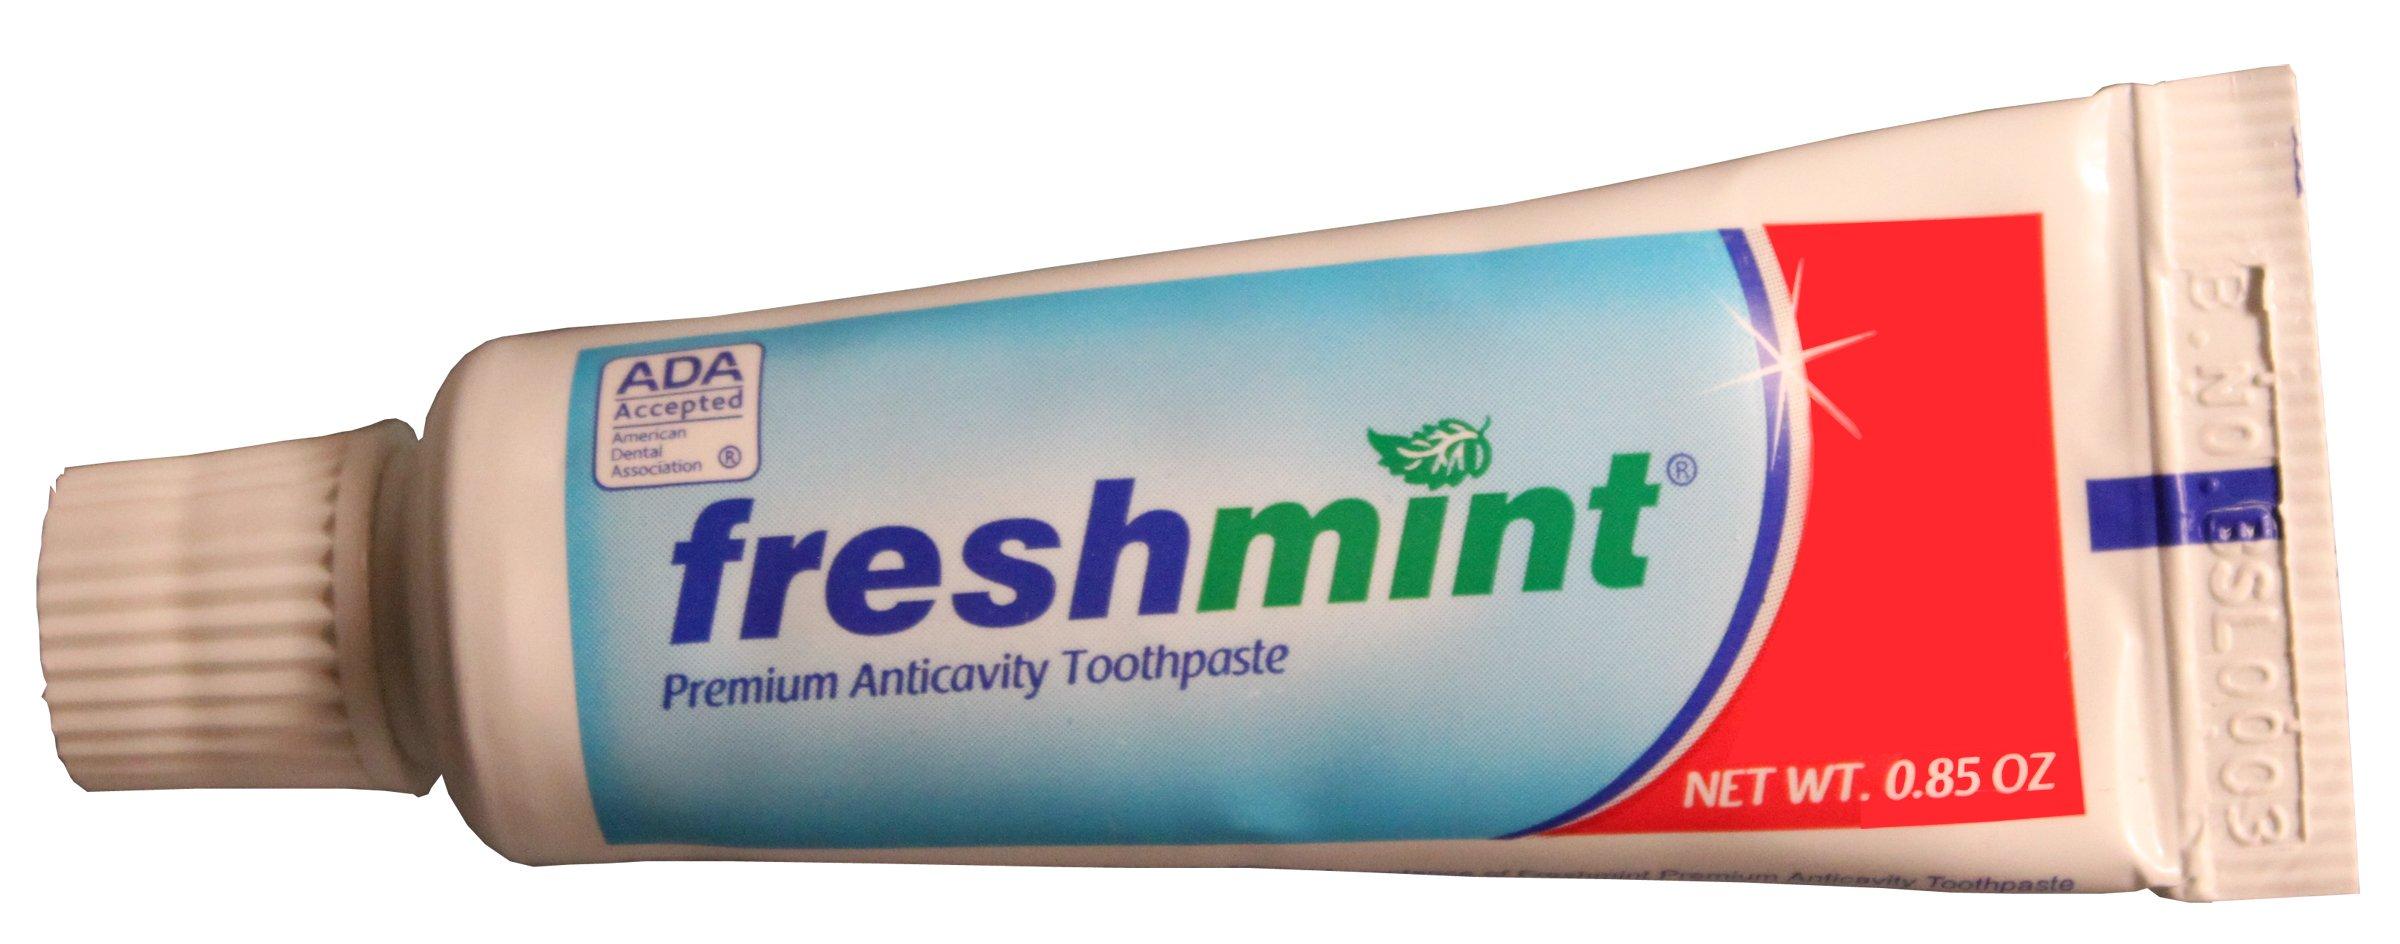 Freshmint Premium Anticavity Toothpaste .85 oz (ADA Approved) 144/CS